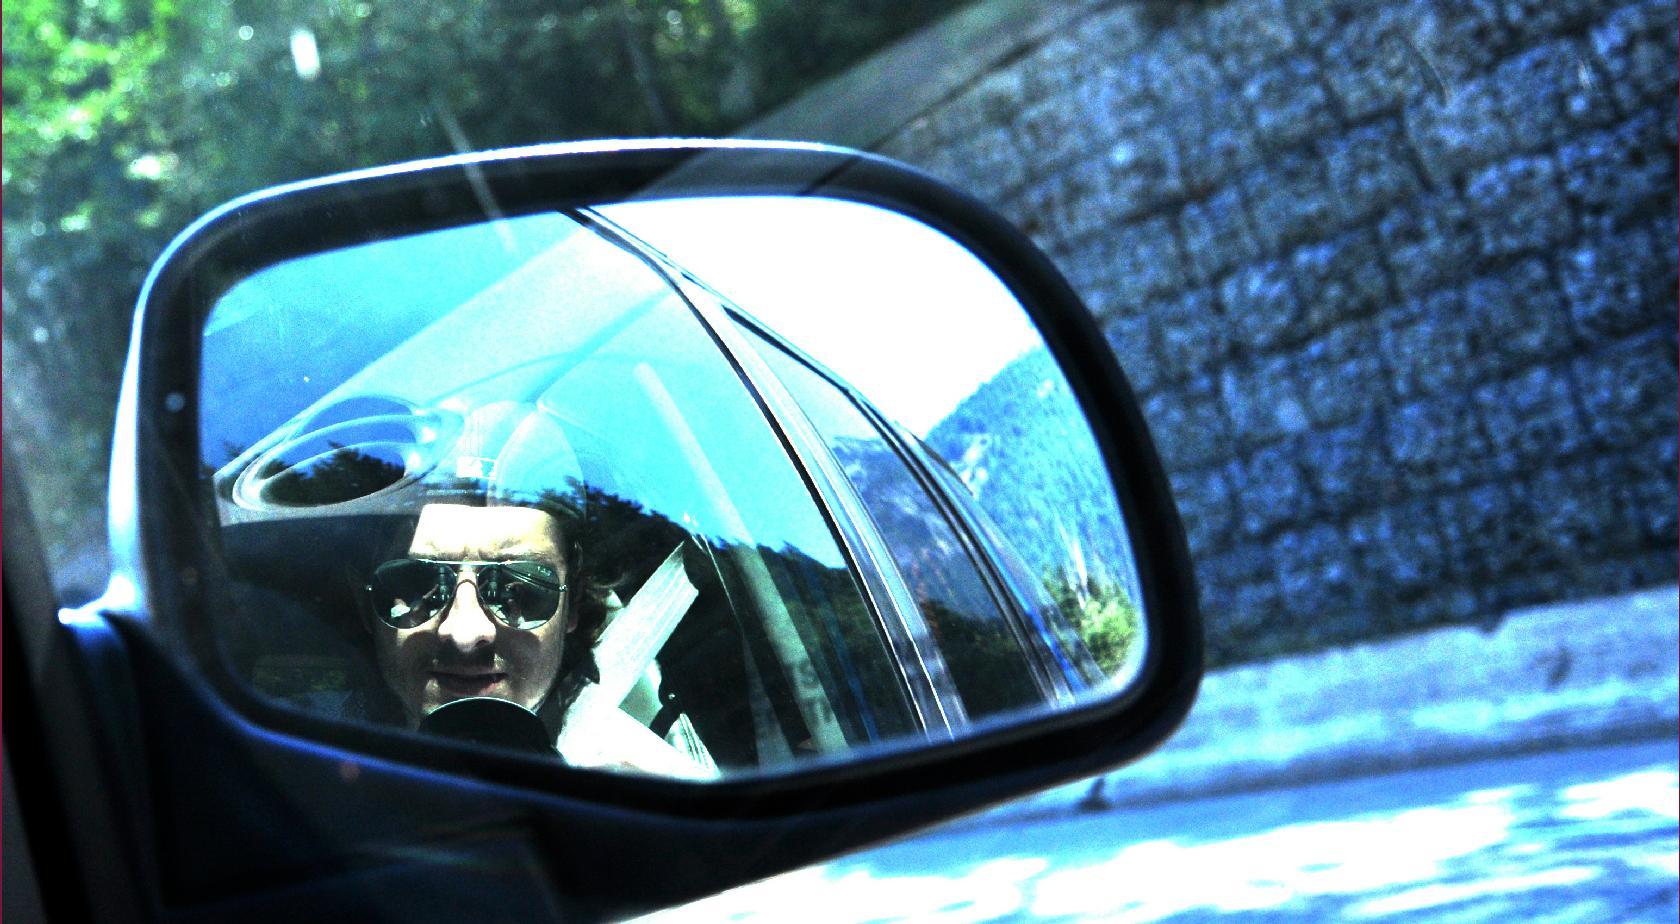 Blaine Sheldon